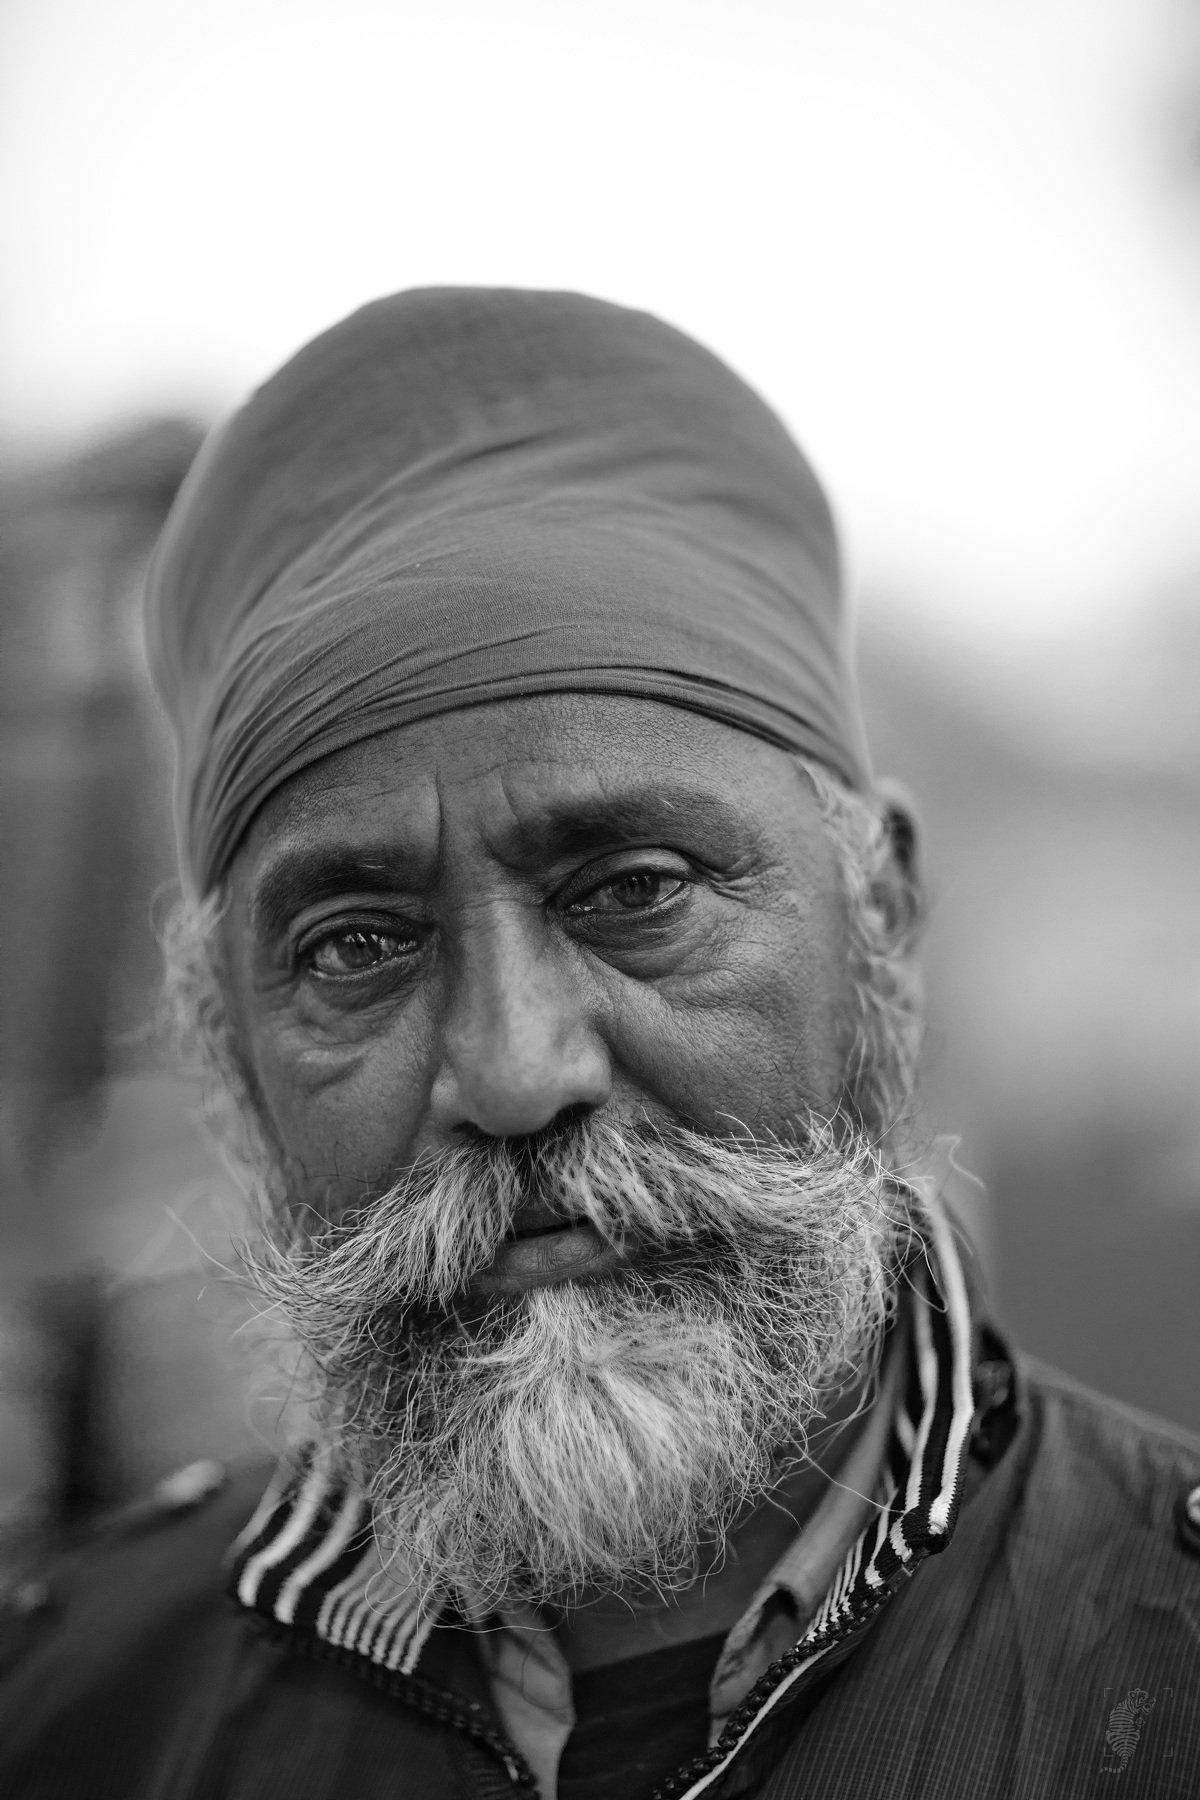 #Portrait #Male # Man # BnW # Monochrome # India, D Abhijit